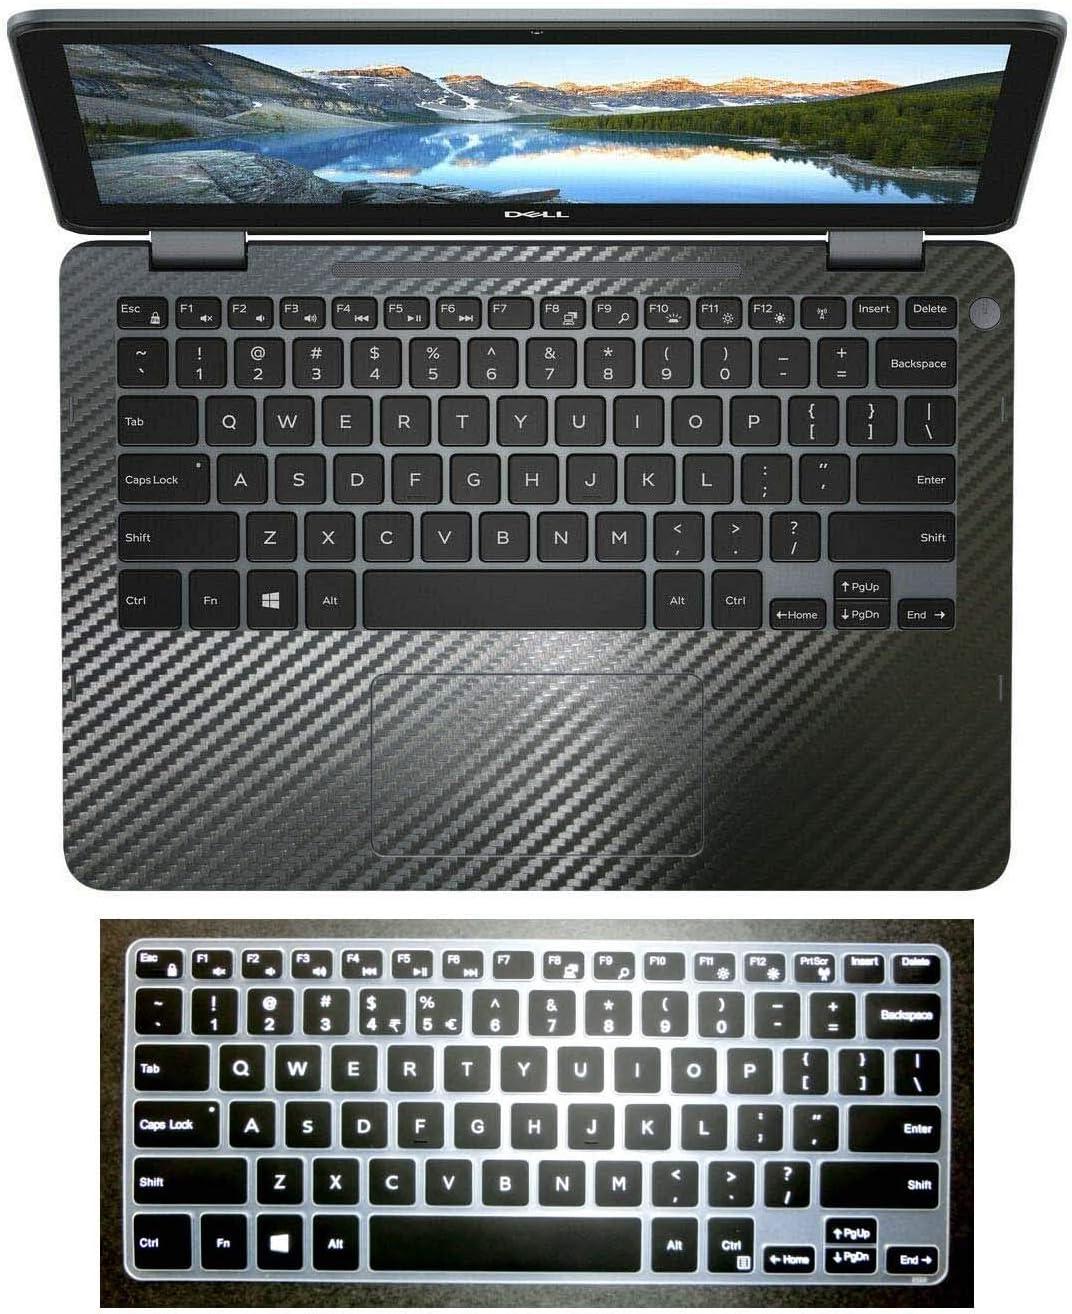 BingoBuy Palmrest Decal Sticker + US Layout Black Keyboard Protector Cover Skin for 11.6'' Dell Inspiron 11-3000 Series(11-3195, Black Carbon Fiber palmrest Cover)